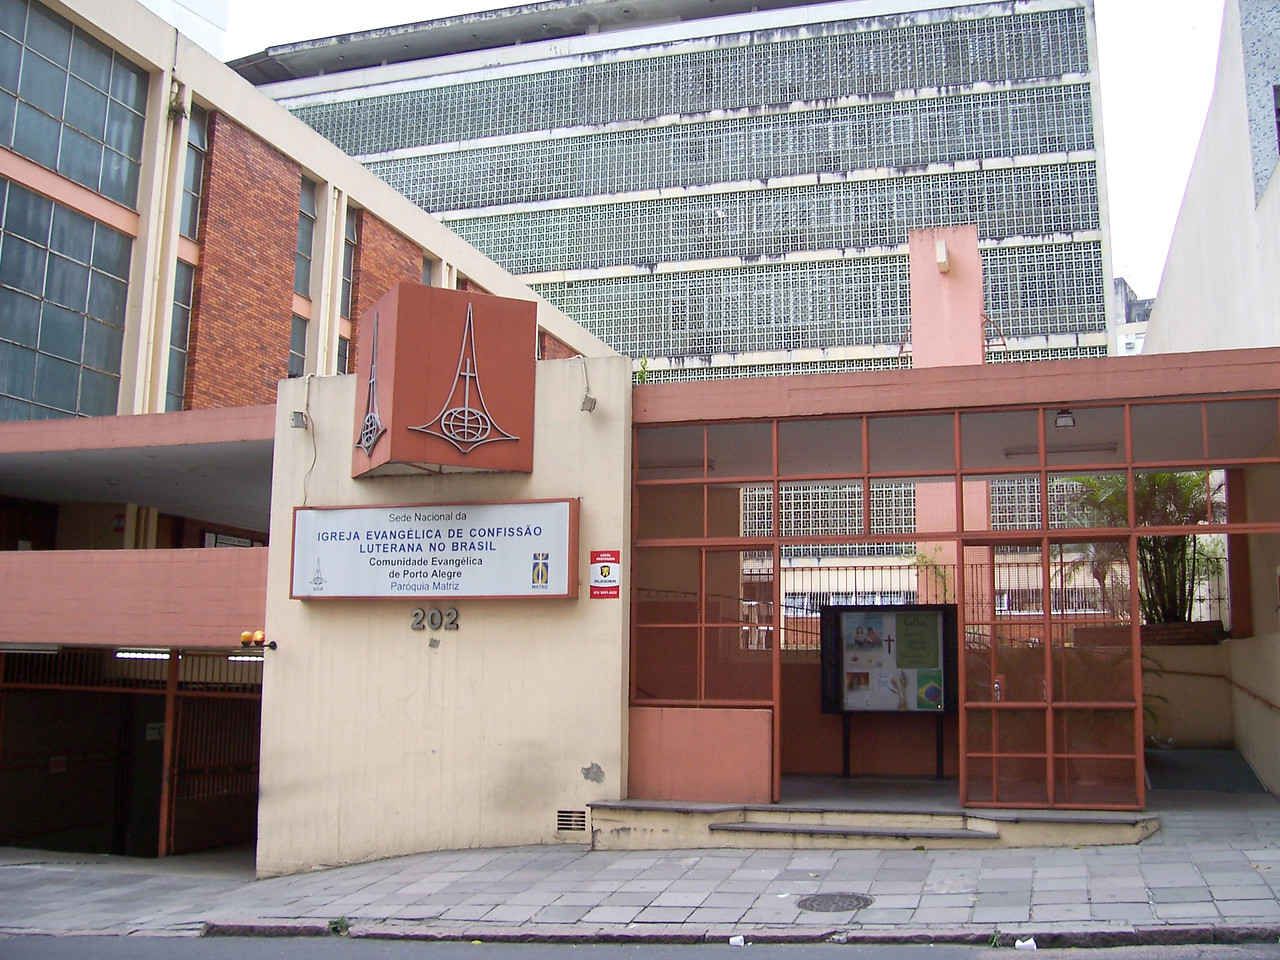 The churchwide office of Igreja Evangélica de Confissão Luterana no Brasil (Evangelical Church of the Lutheran Confession in Brazil), Sao Paulo, Brazil.